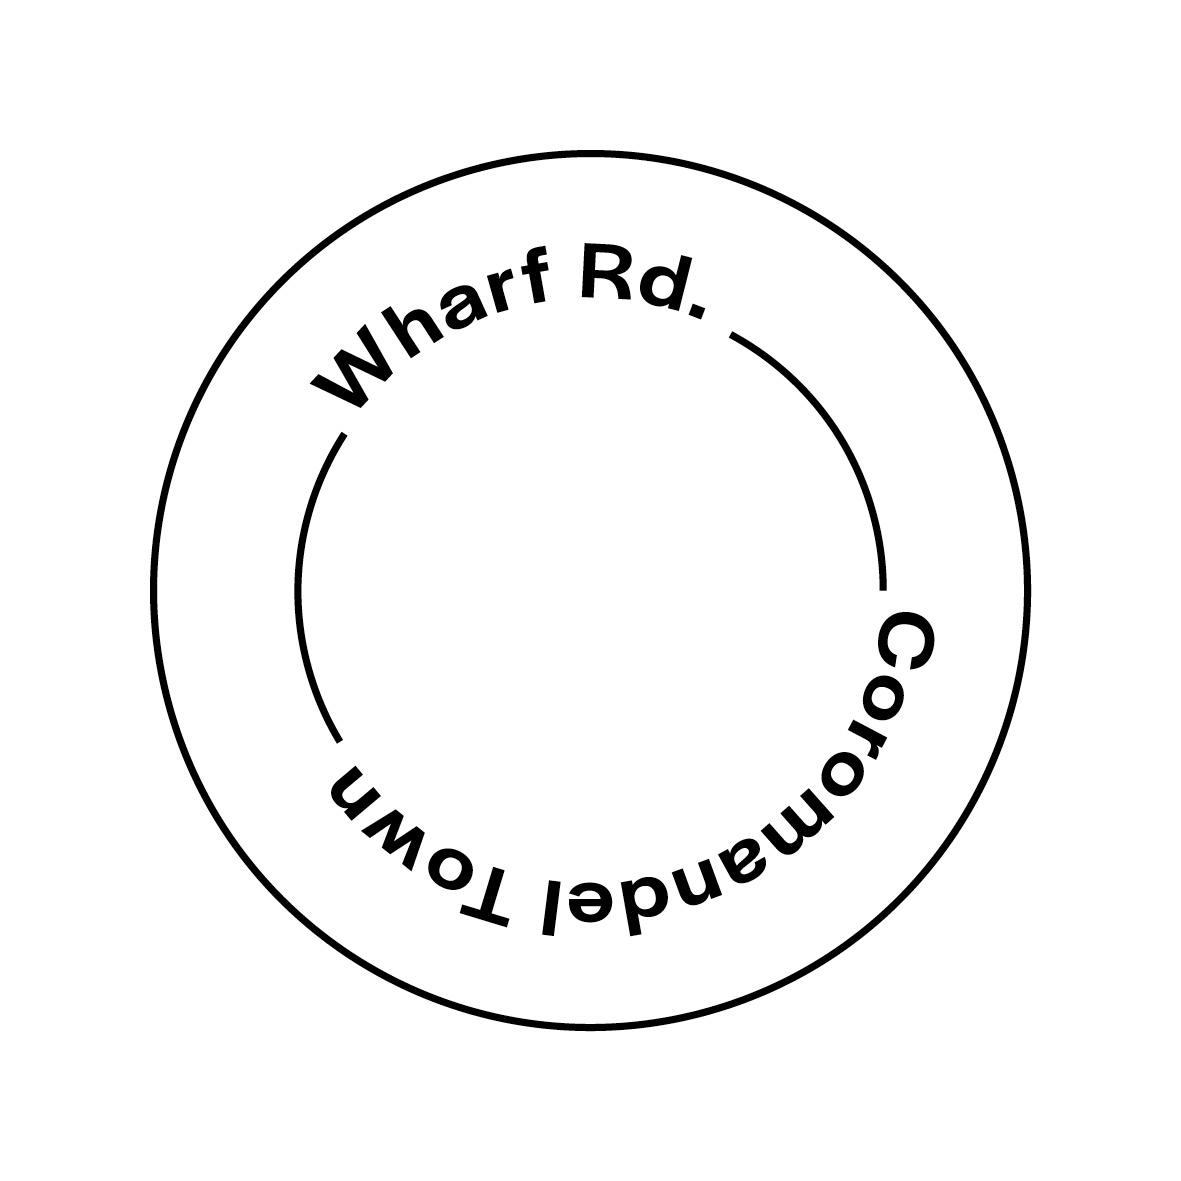 Wharf_Rd_Stamp-black.jpg